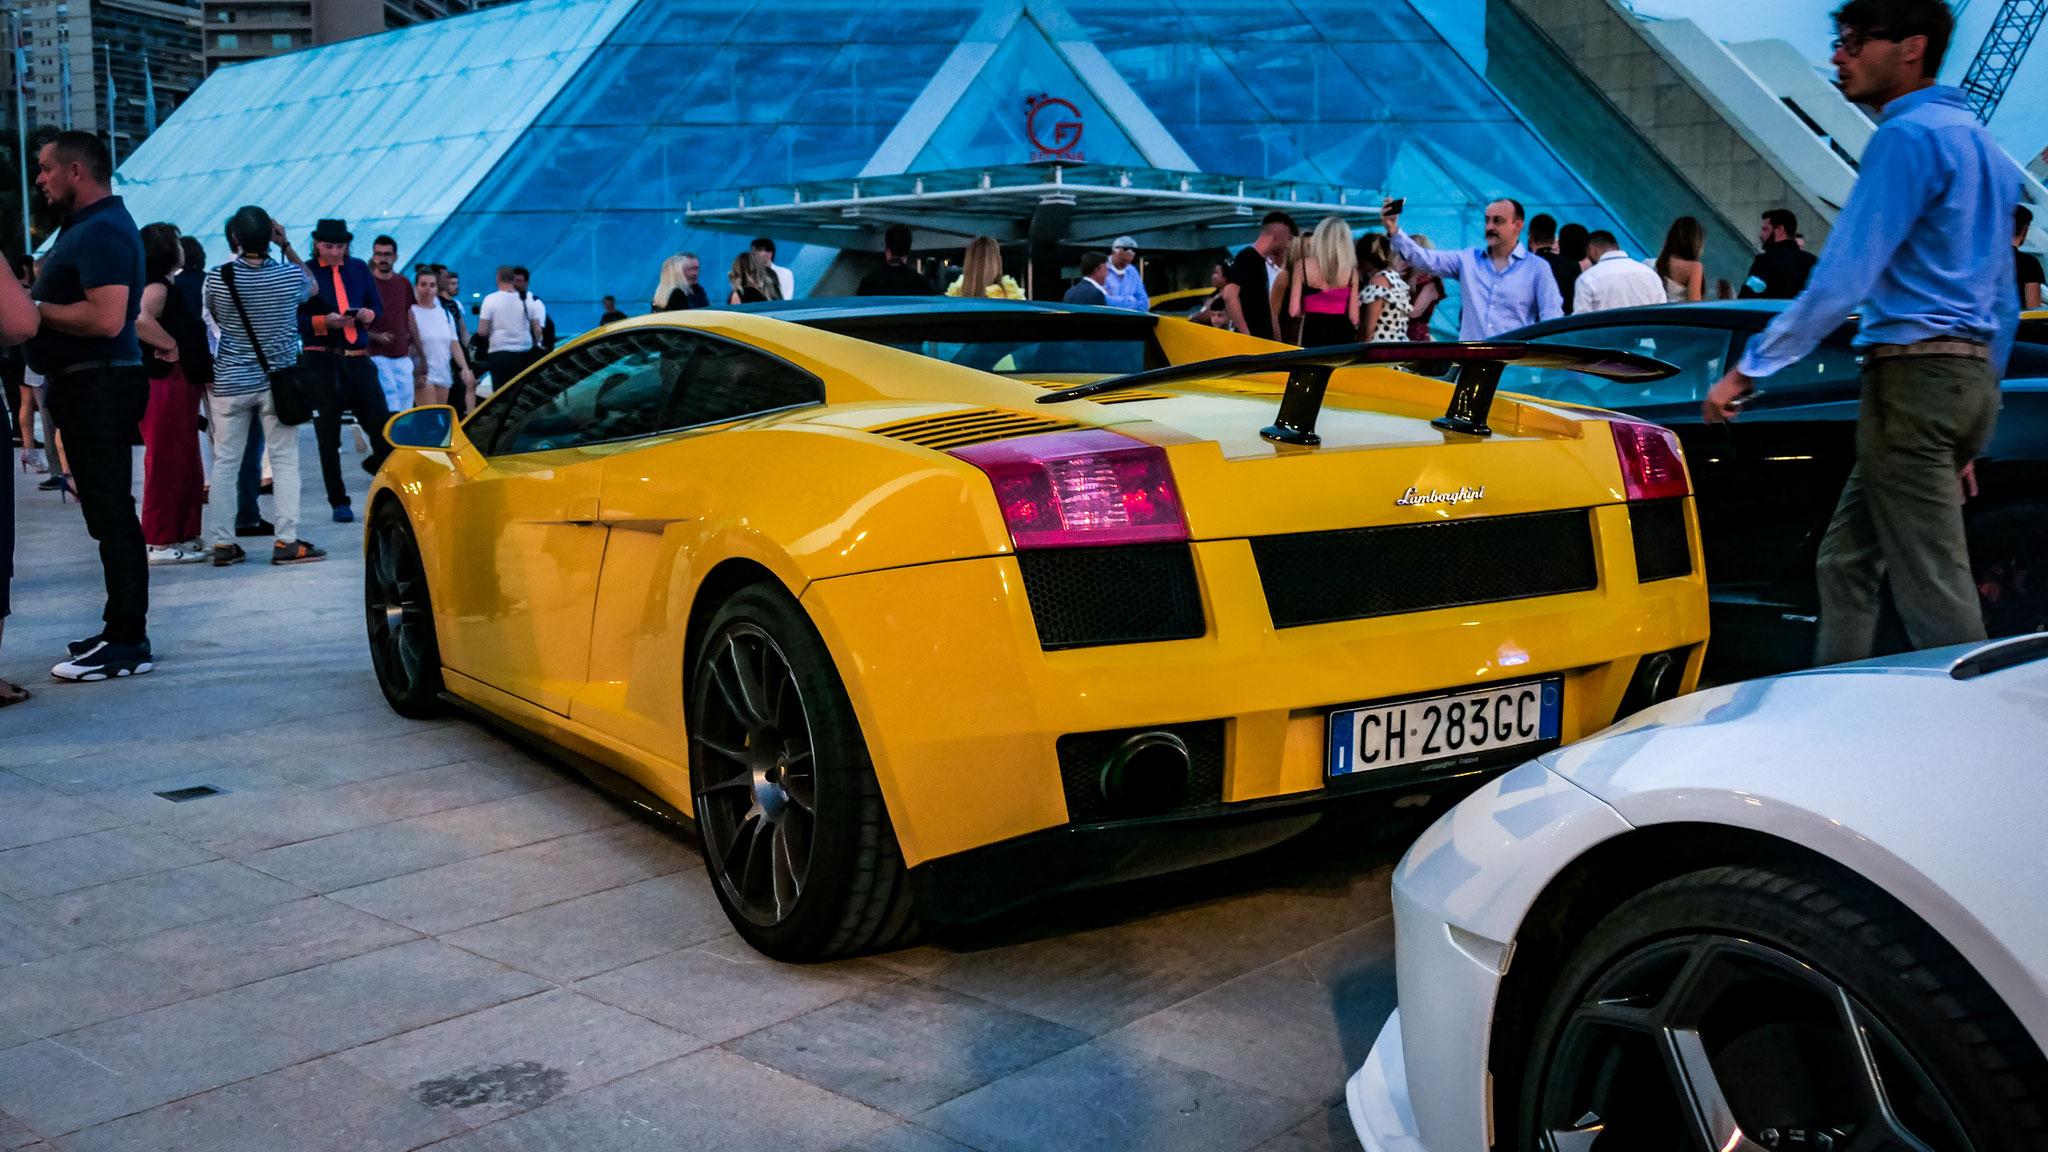 Lamborghini Gallardo - CH-283-GC (ITA)